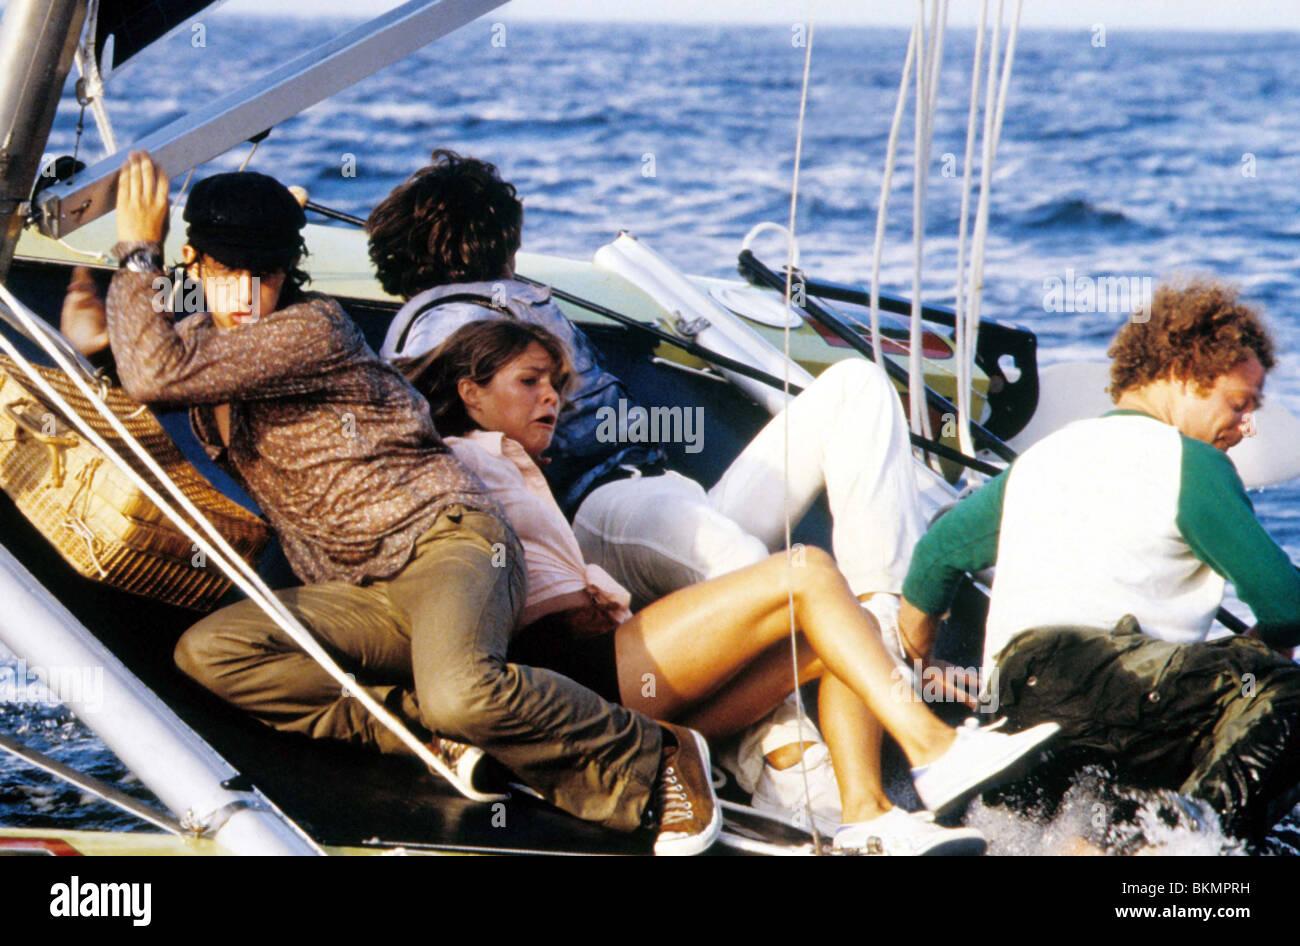 Jaws 2 1978 Stock Photo Alamy